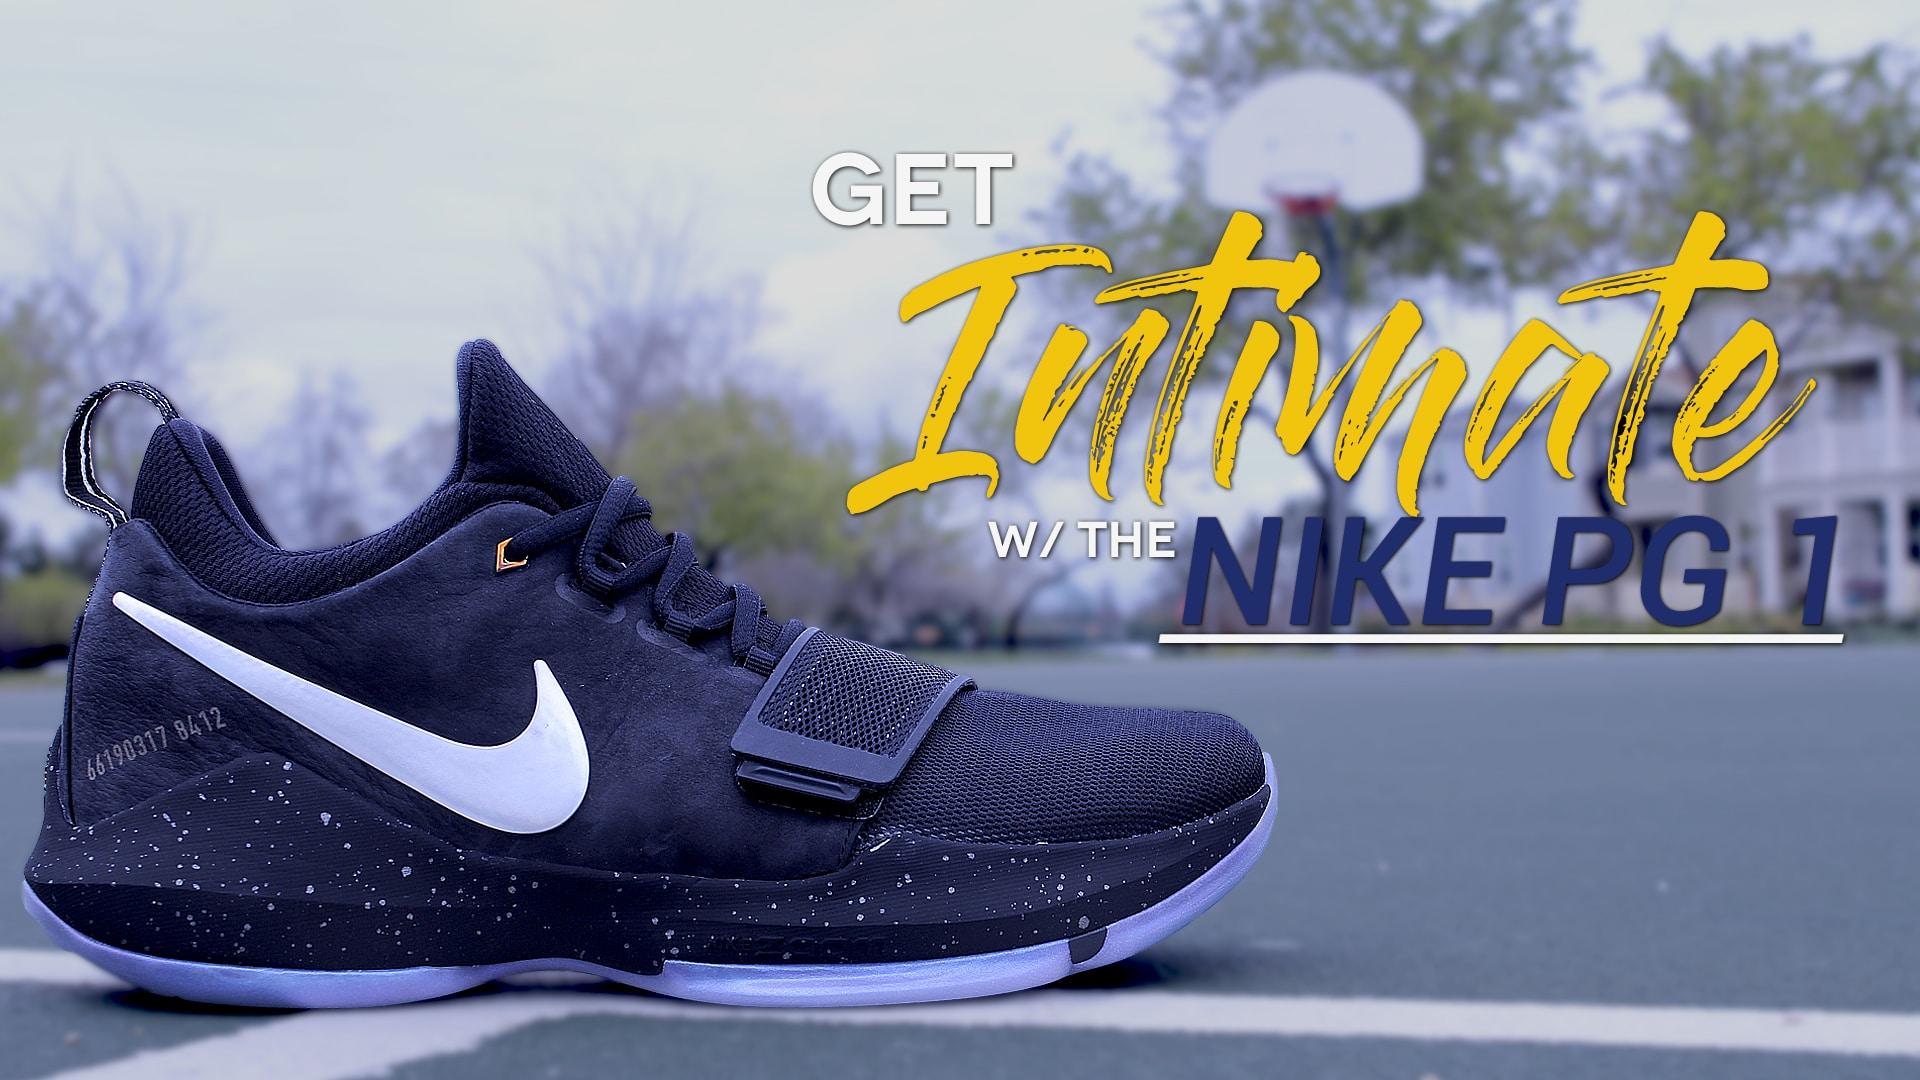 Intimate – Nike PG 1